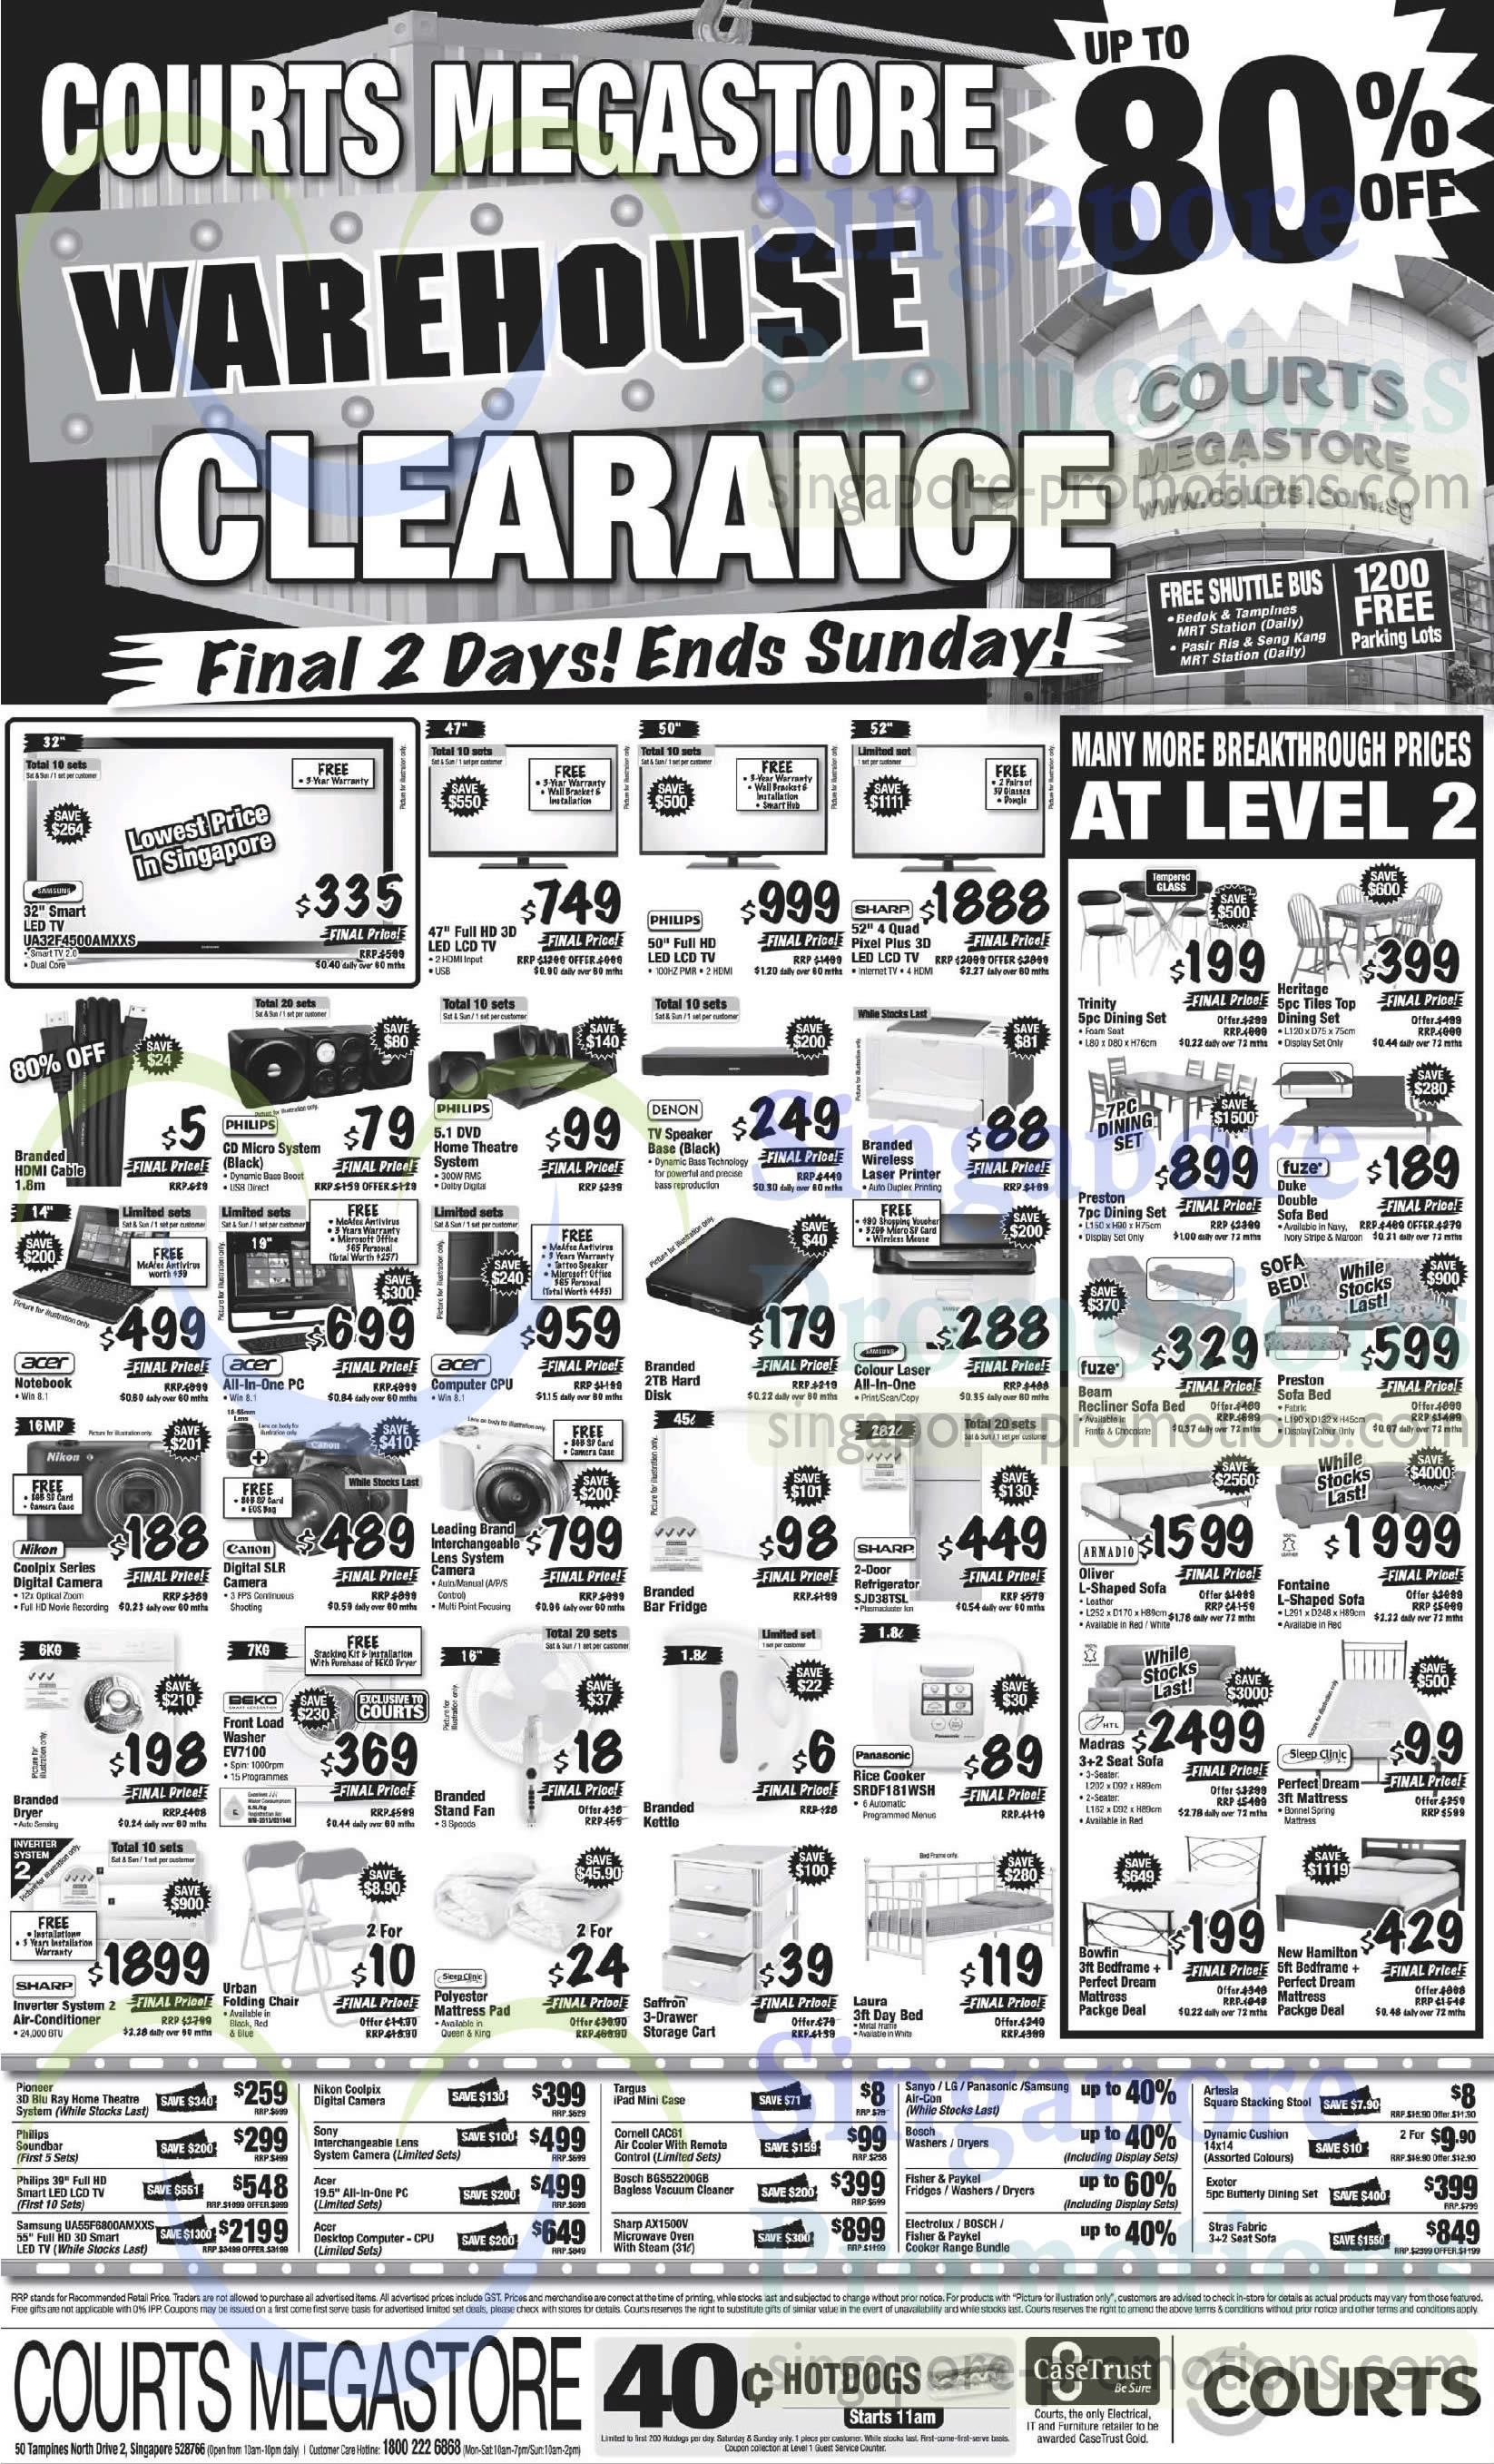 Megastore Warehouse Clearance TVs, Cameras, Fridges, Fans